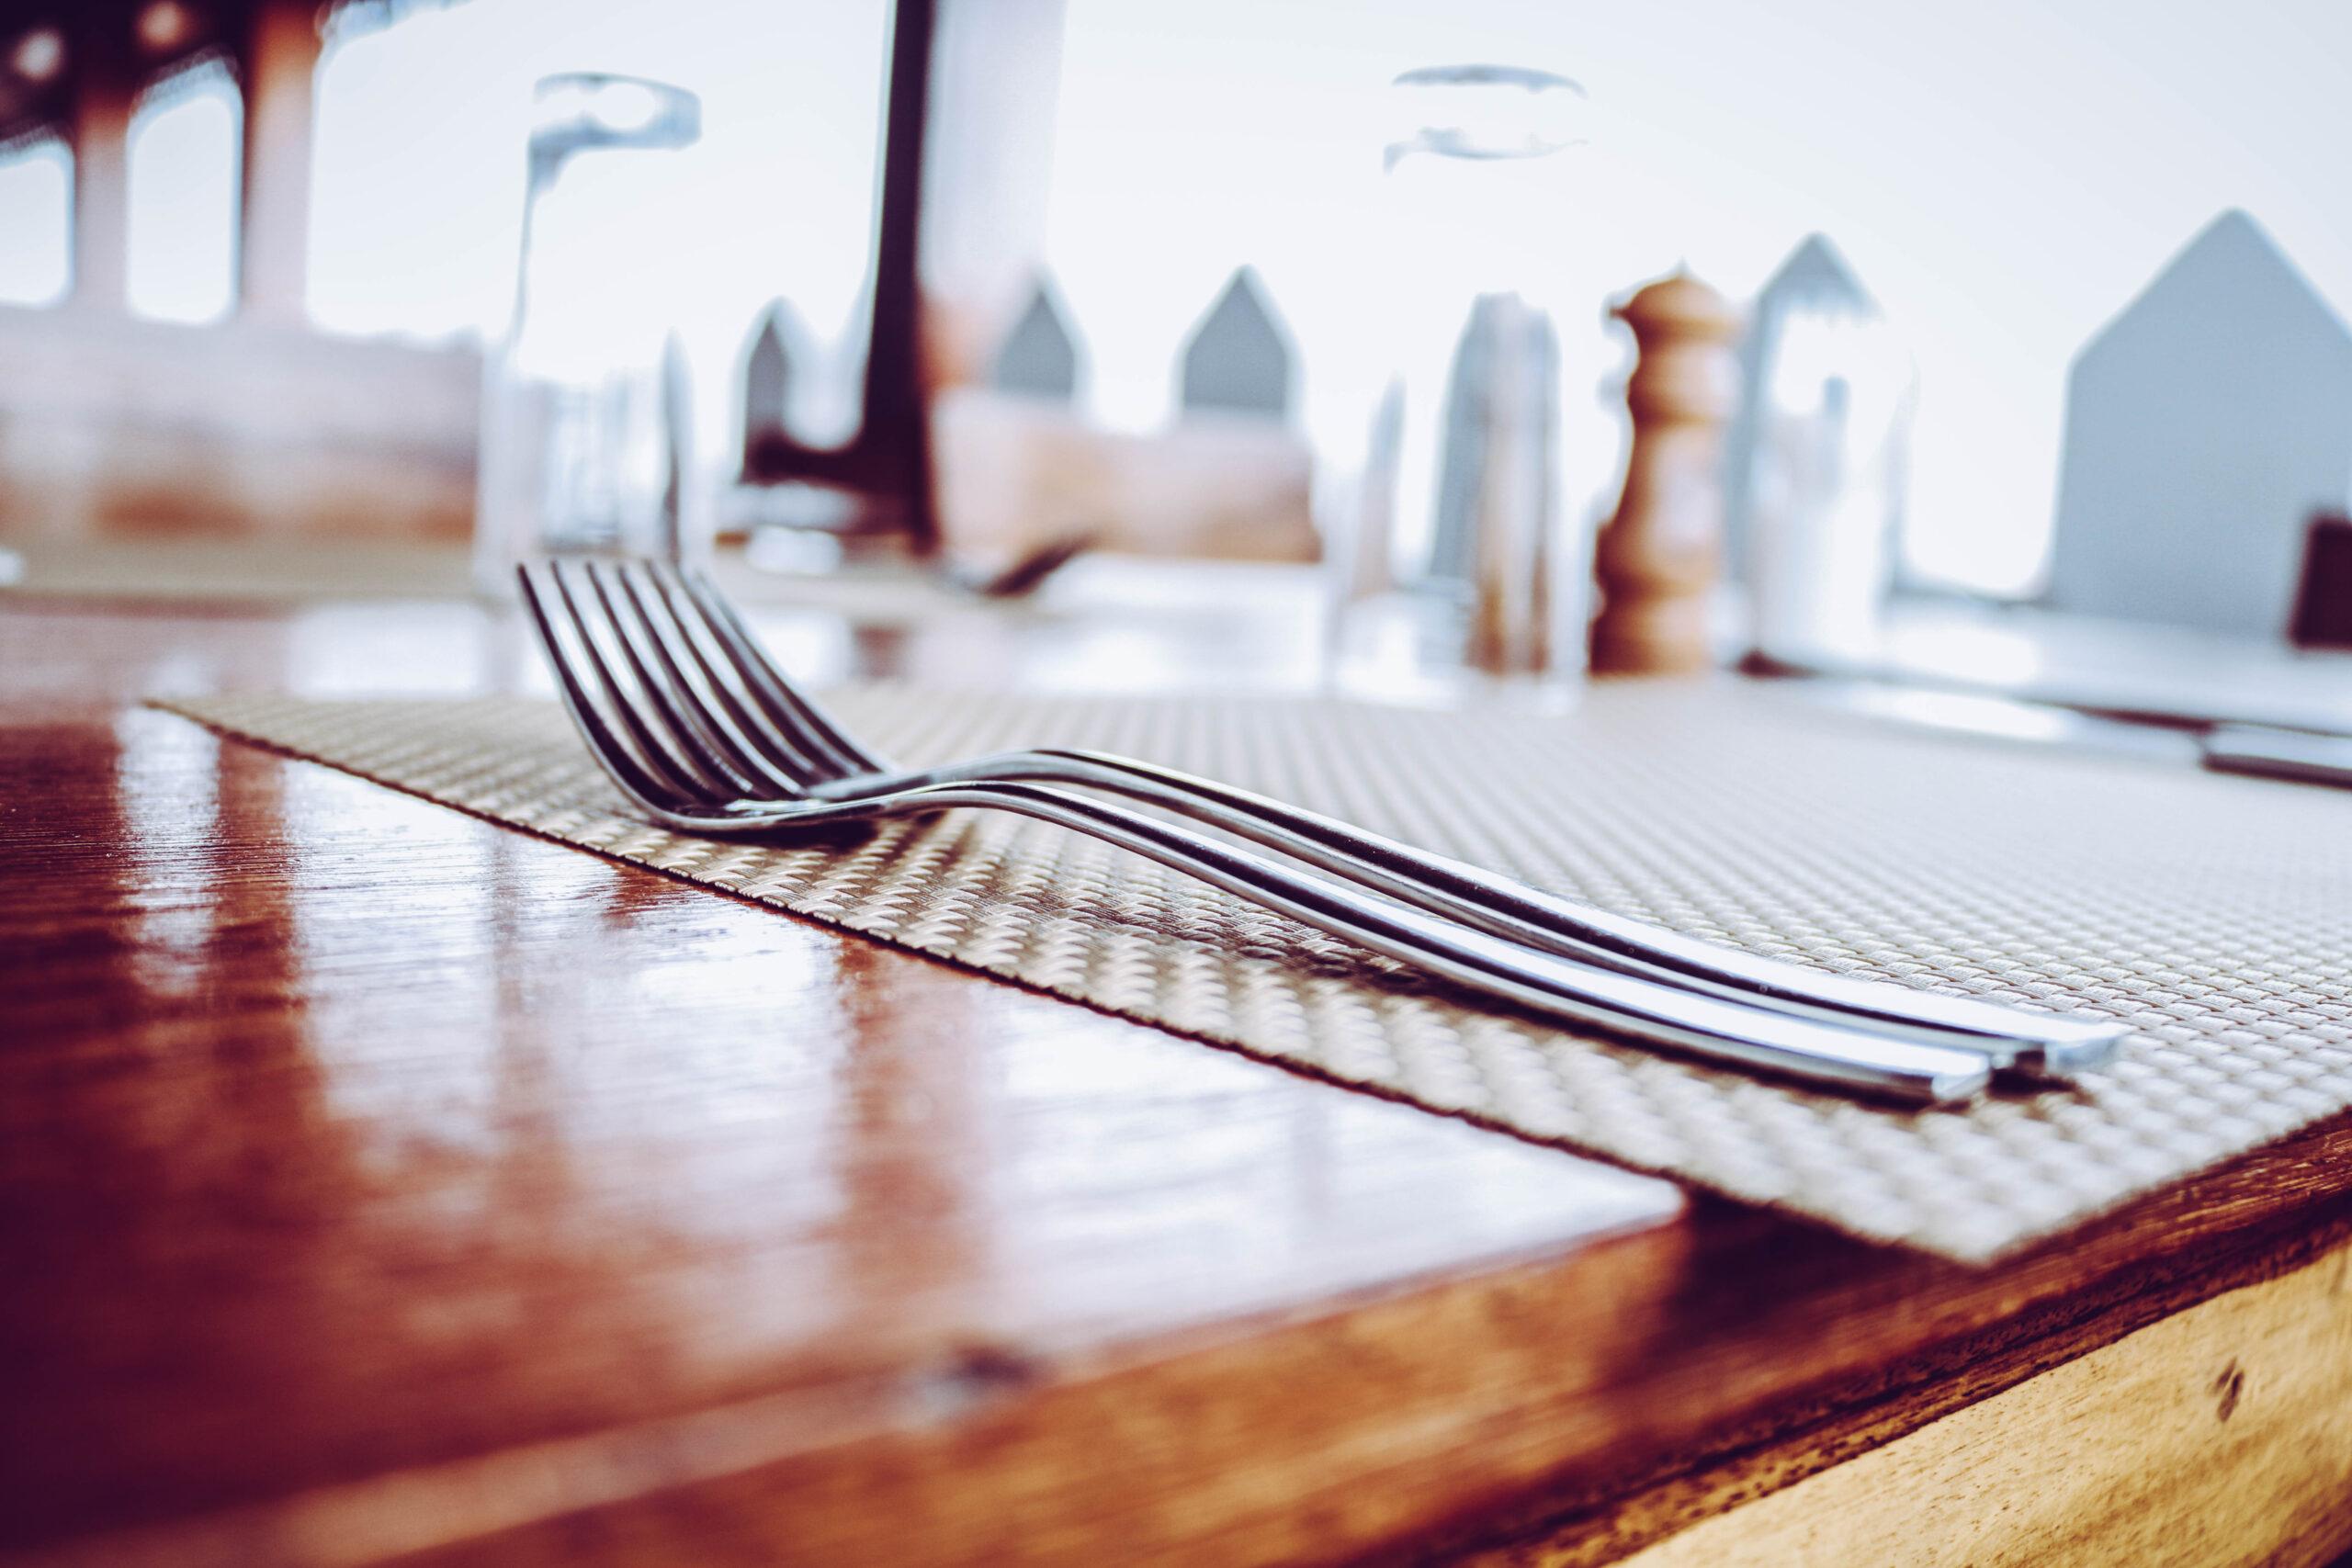 plexiglass shields are the future for restaurants